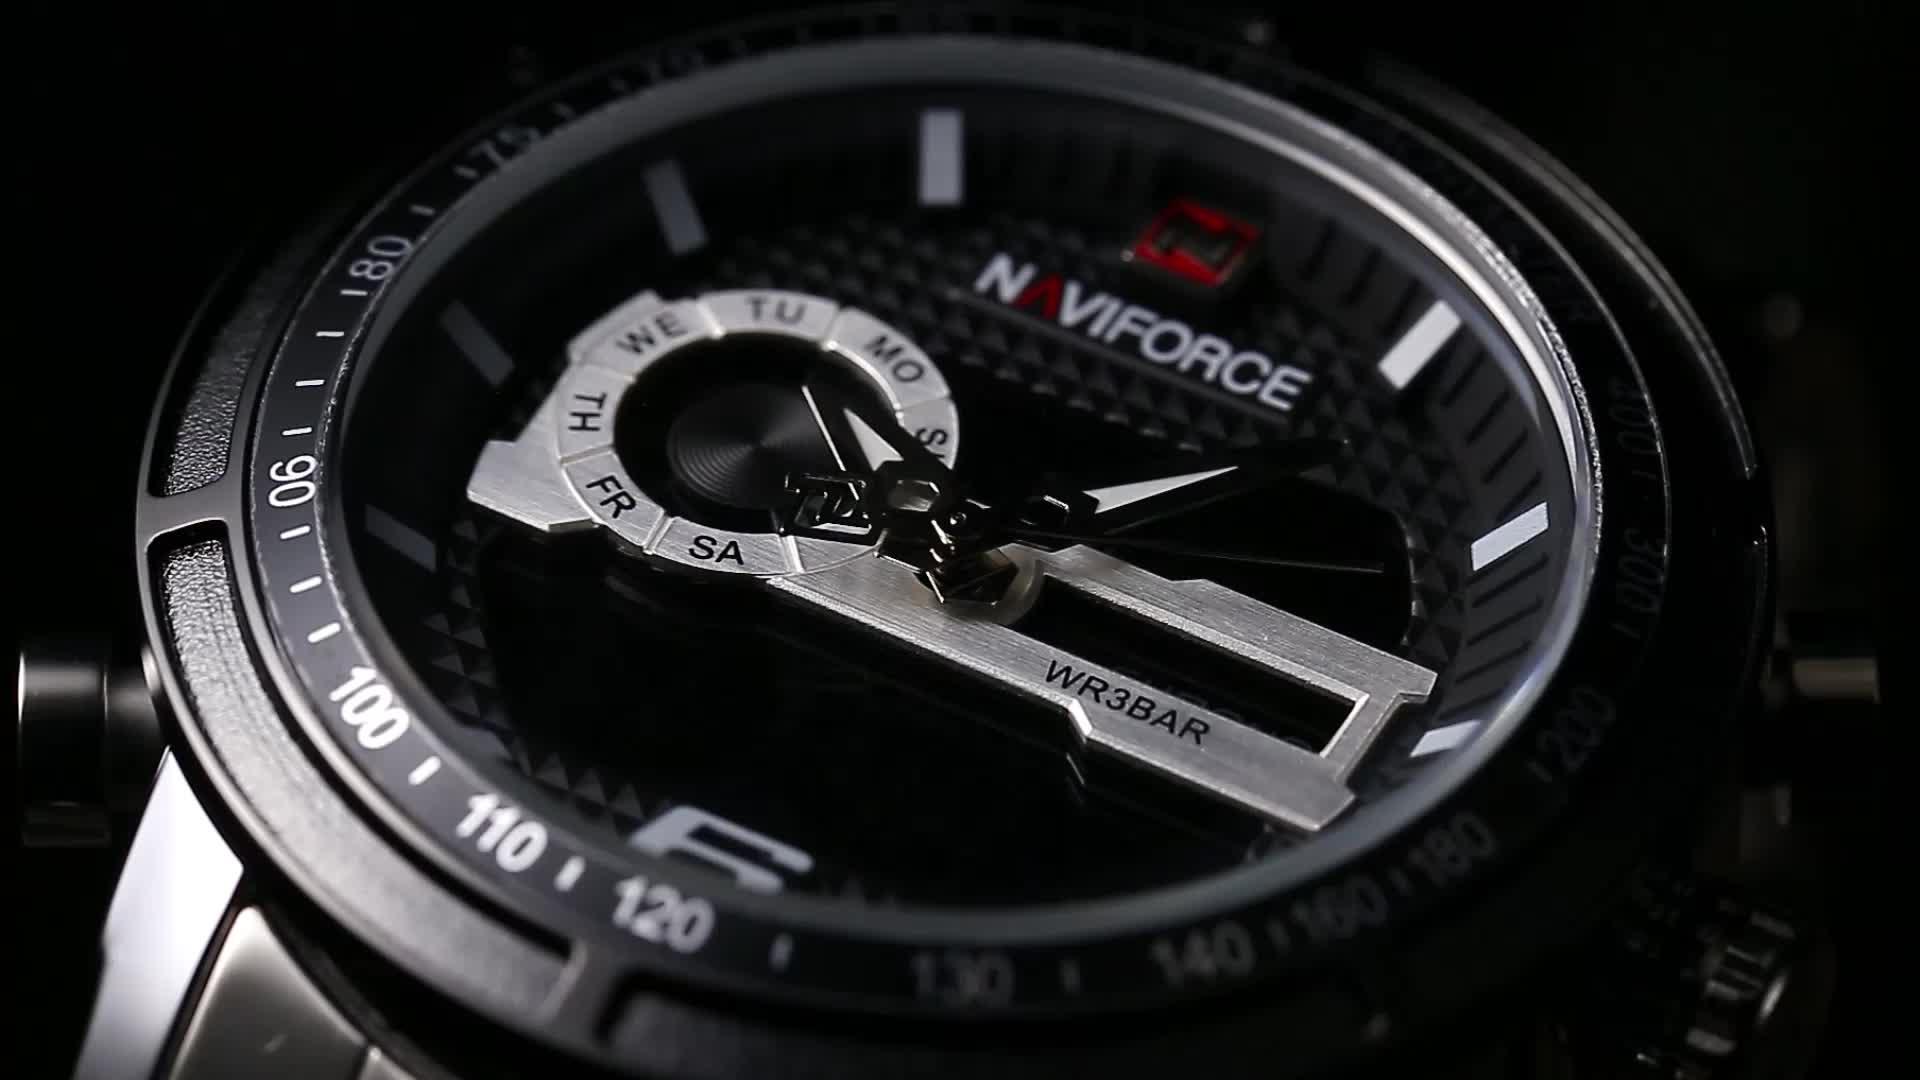 NF 9119 mens digital alloy Waterproof wrist sportsofficial store ,brand owner of Naviforce Watch